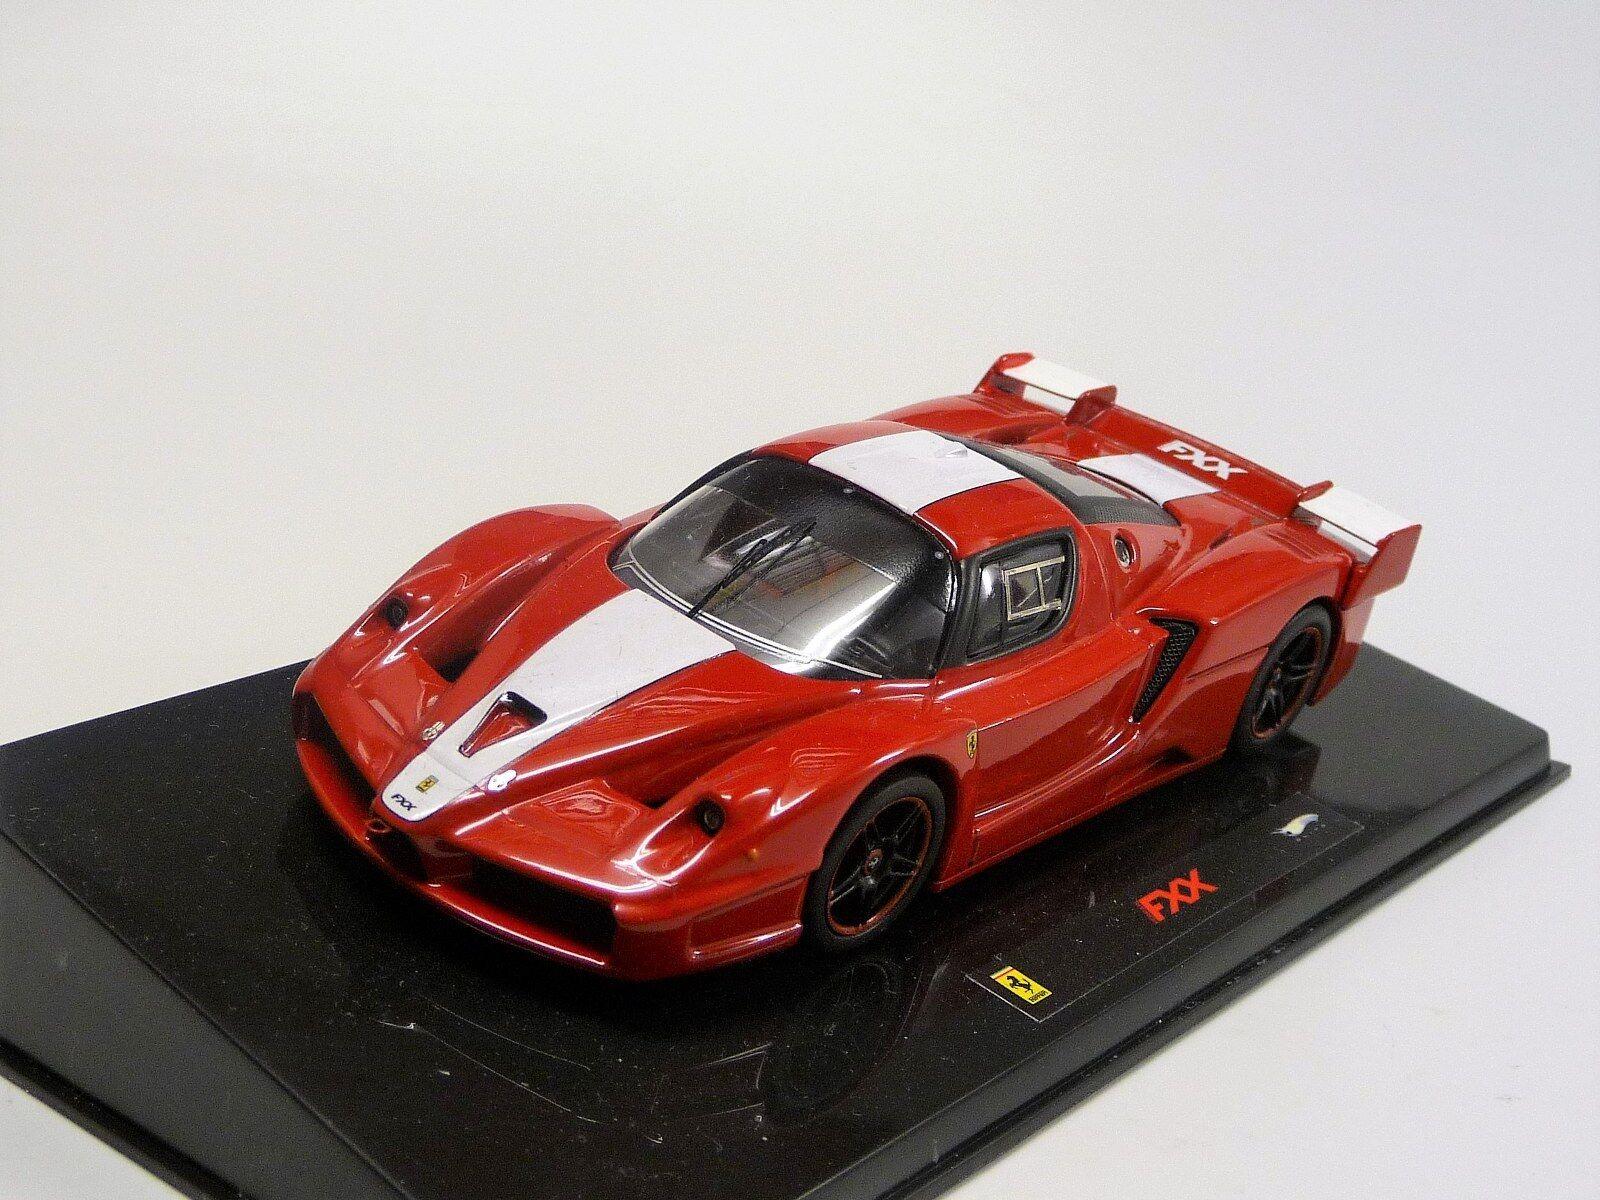 Ferrari FXX rot Hot Wheels Elite N5605 Neu in OVP 1 43  | Sale Online Shop